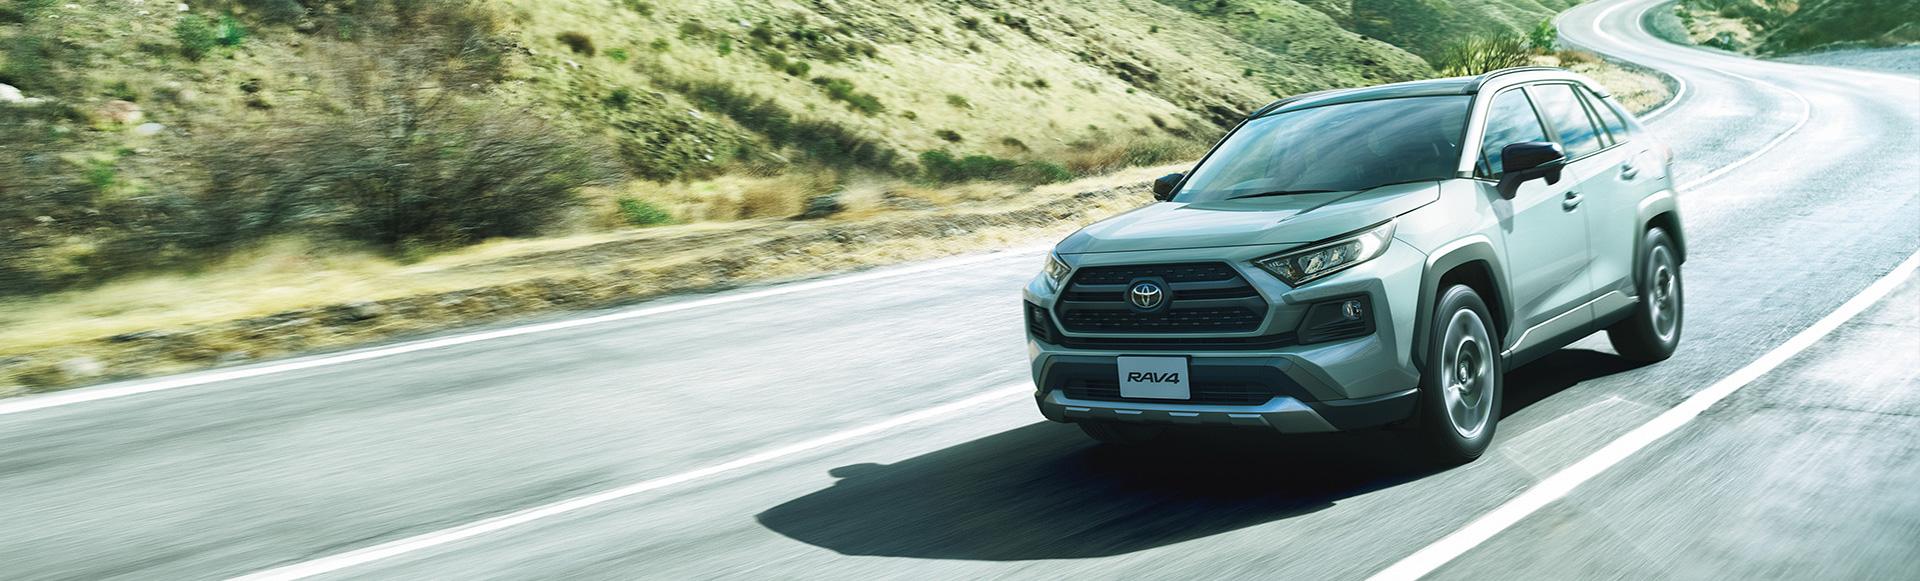 Toyota Rolls Out All-New RAV4 | Toyota | Global Newsroom | Toyota